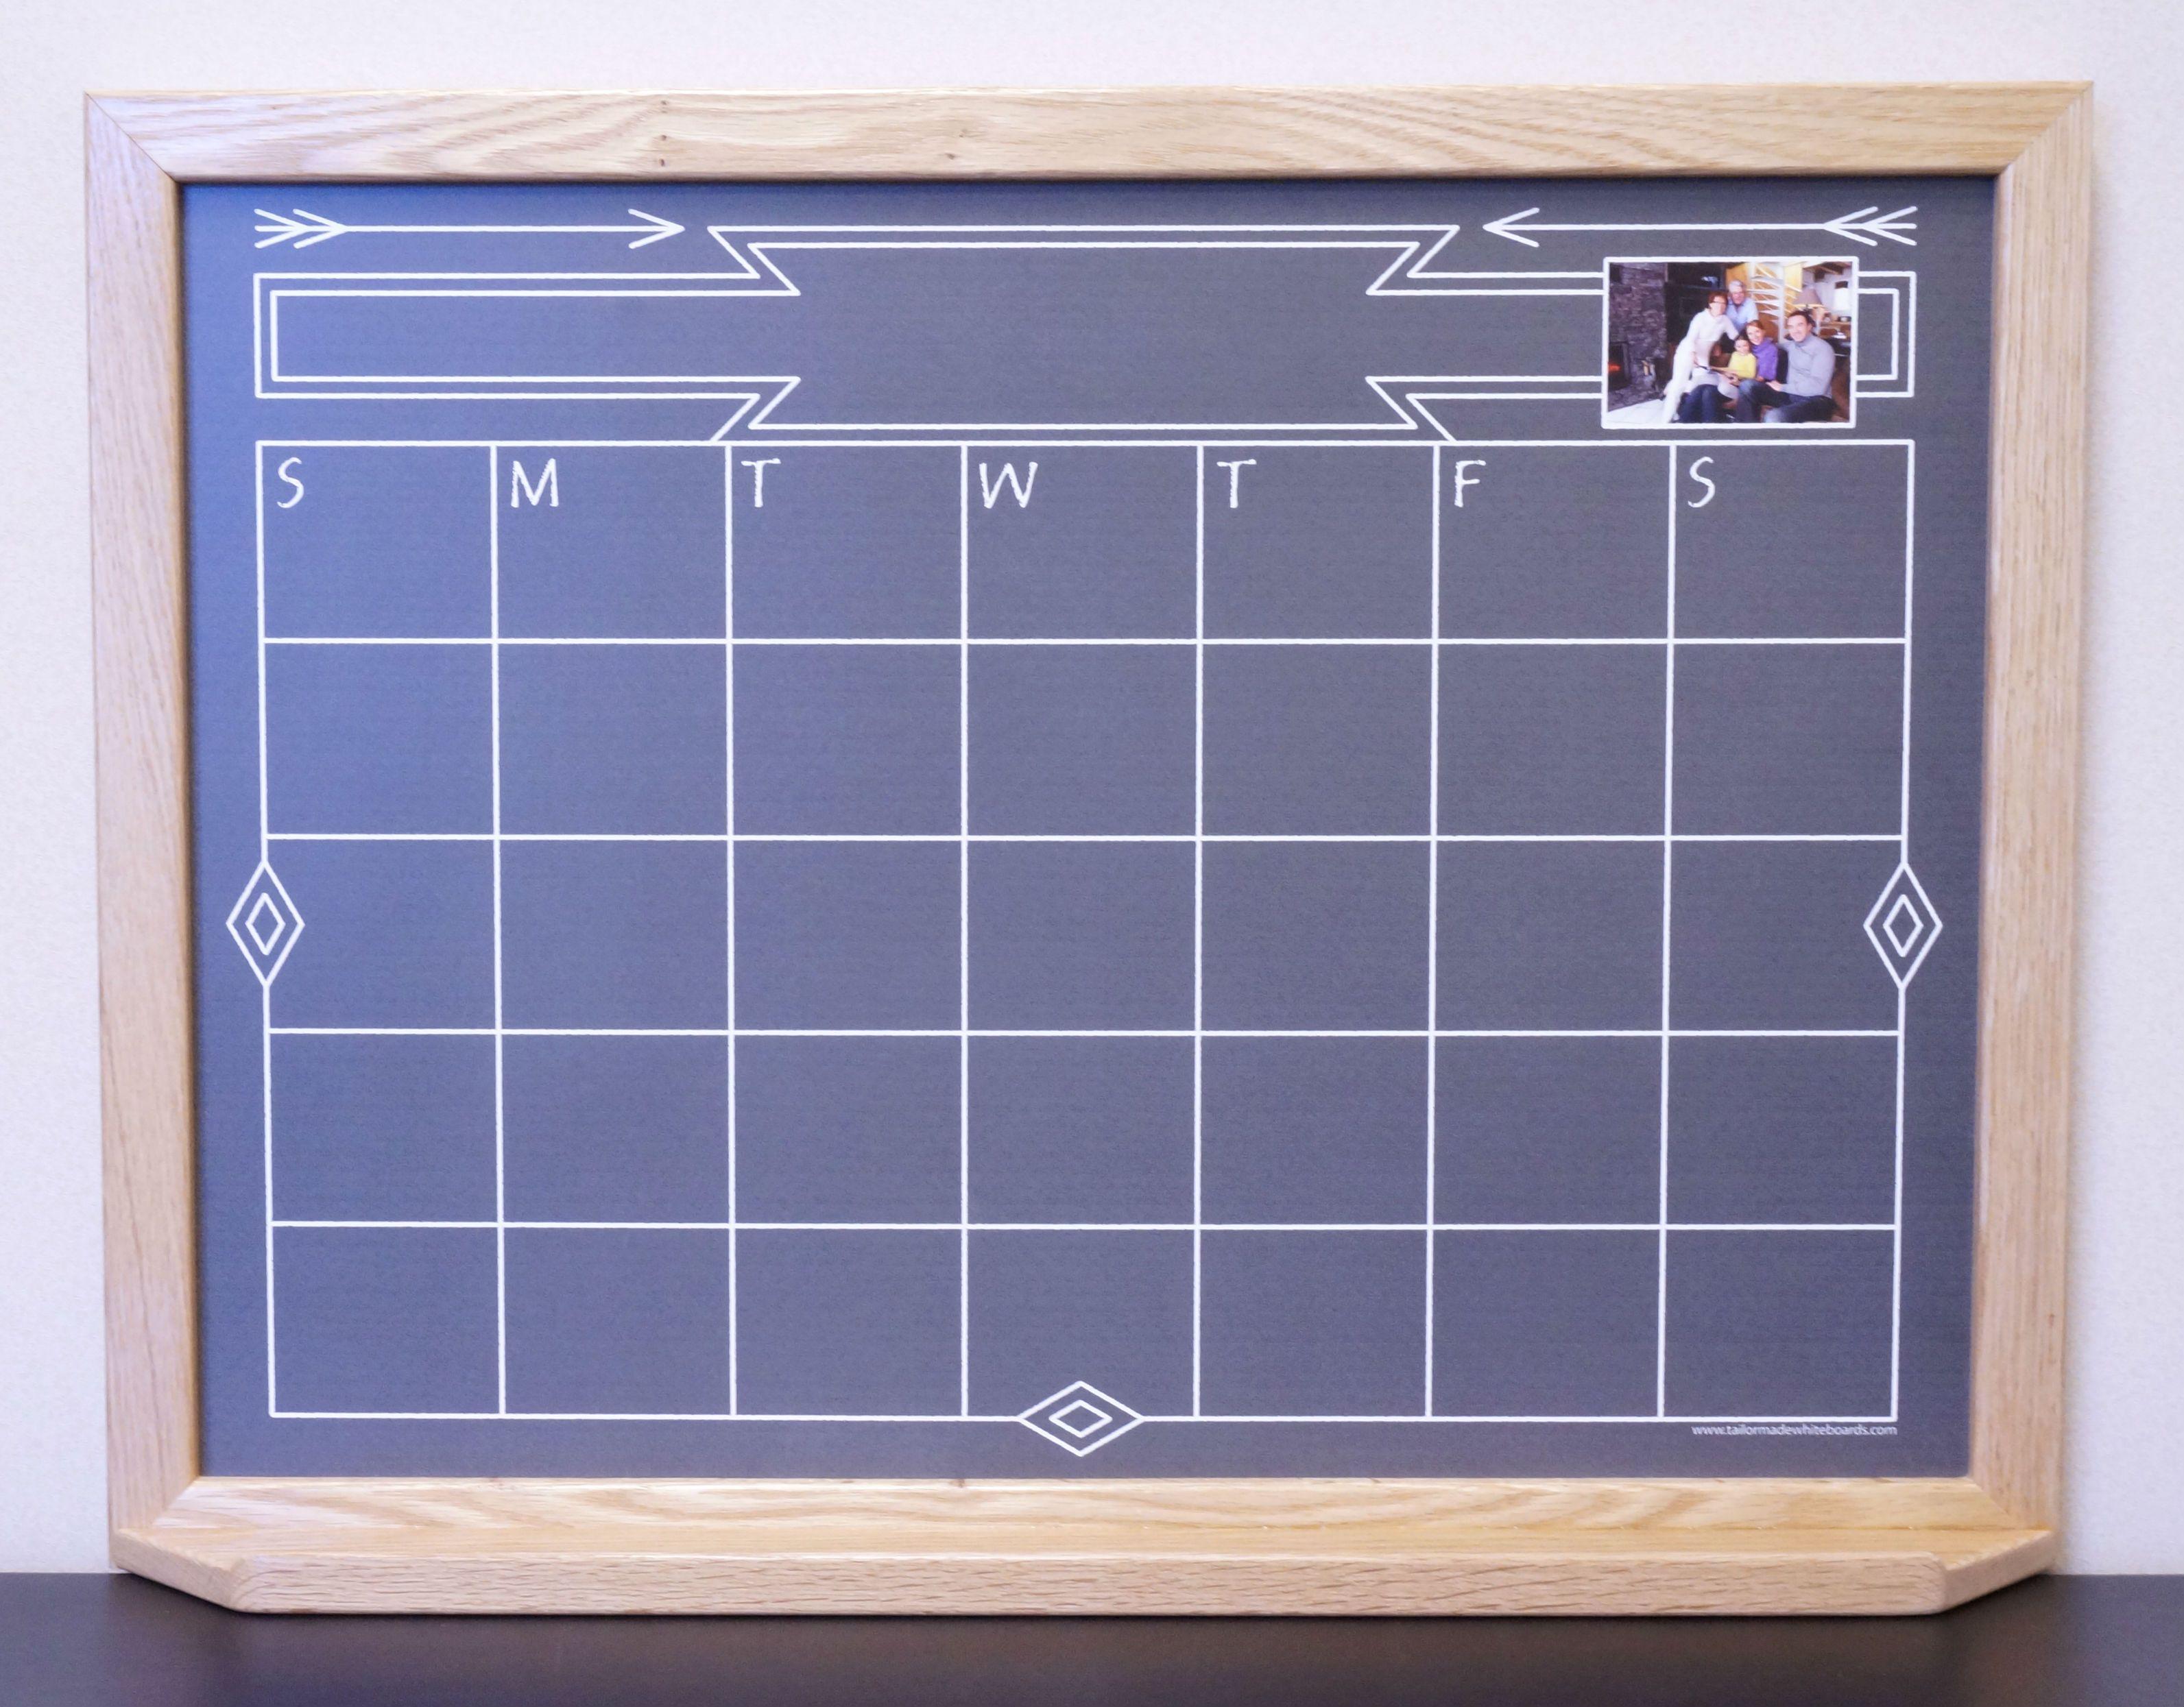 Black Southwestern Chalkboard Style Whiteboard Calendar  Framed Dry Erase